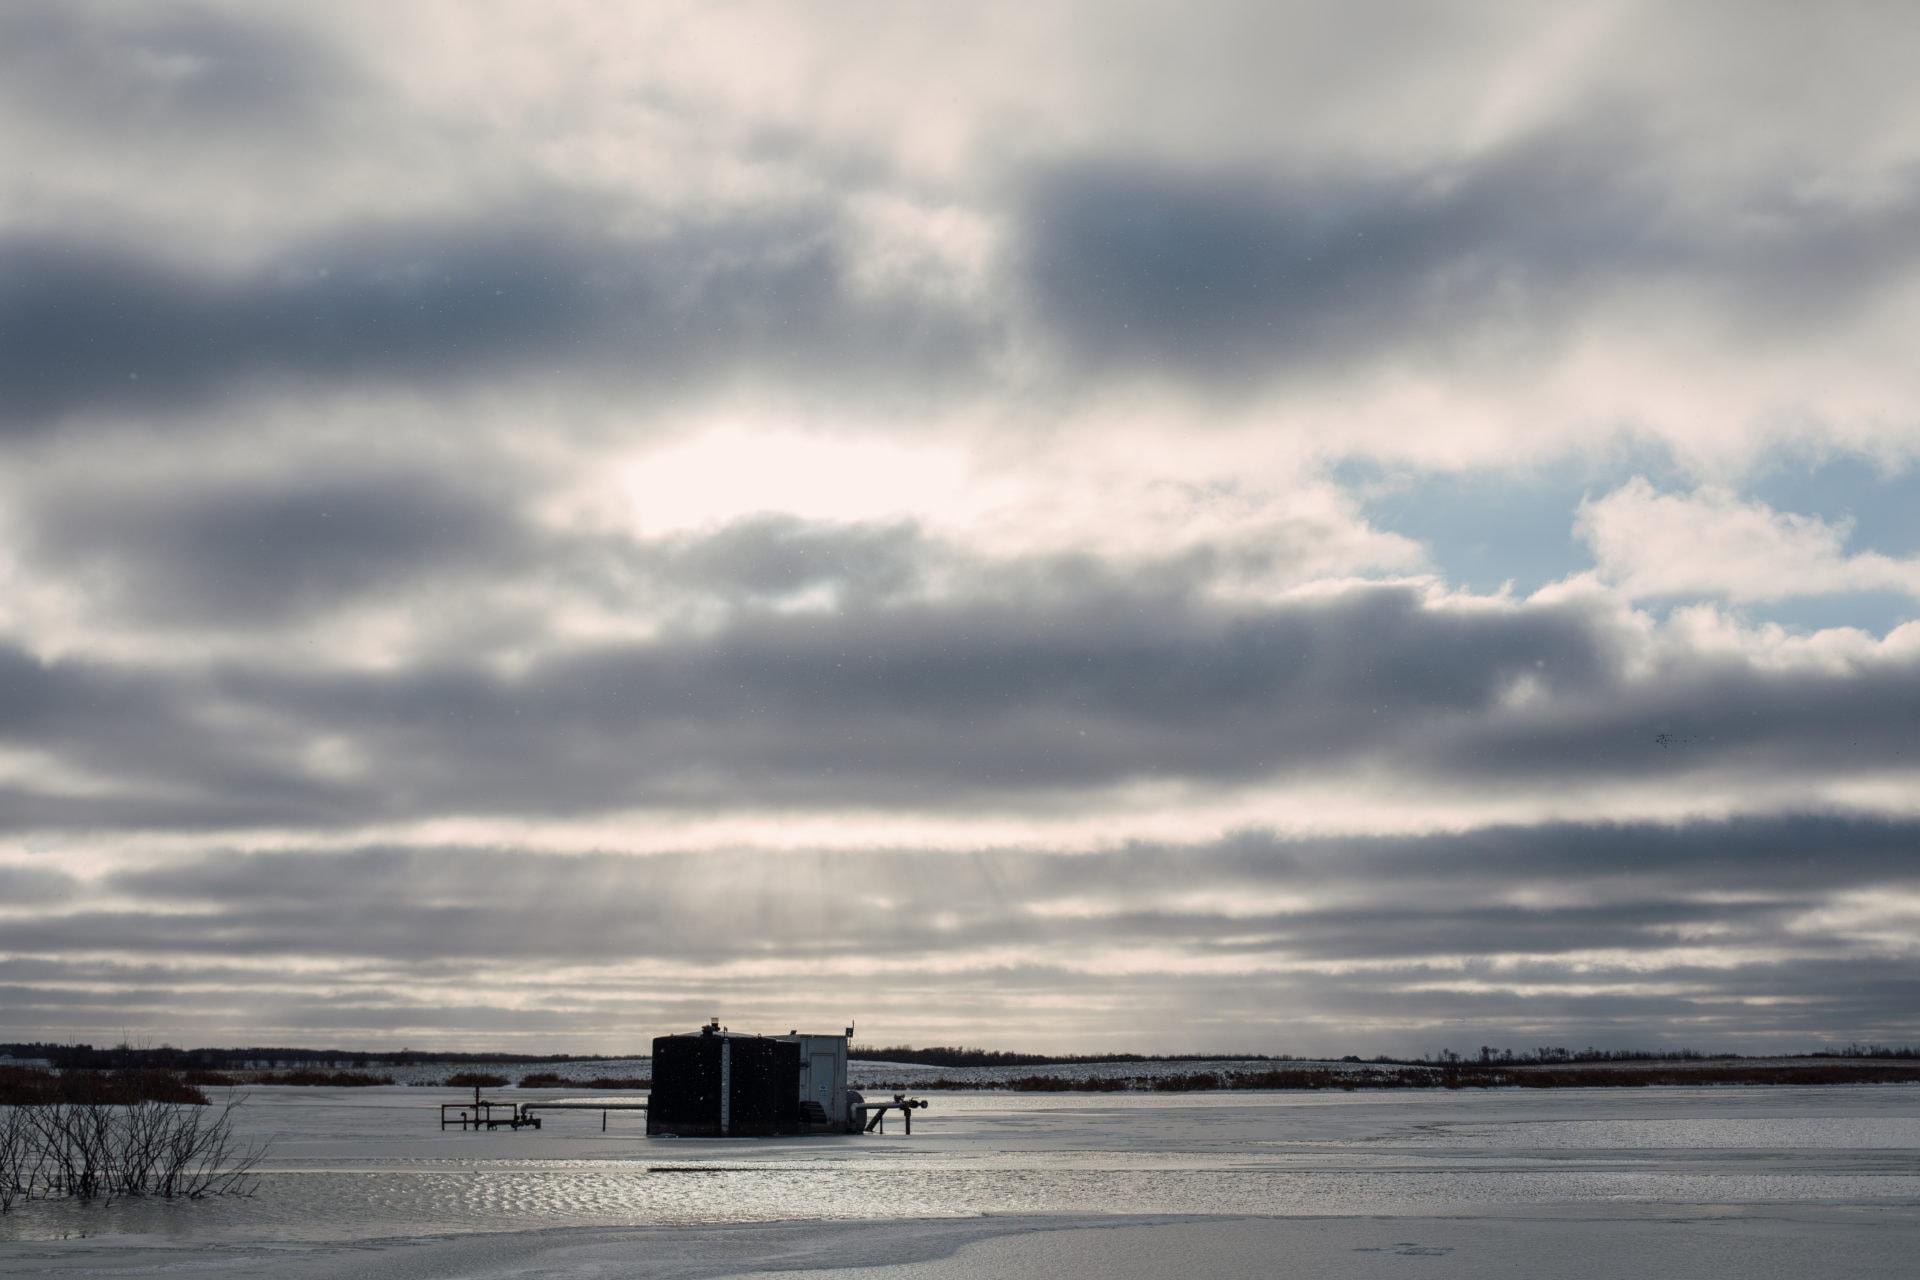 Oil lease site in Wainwright, Alberta on Monday, November 5, 2018. Amber Bracken